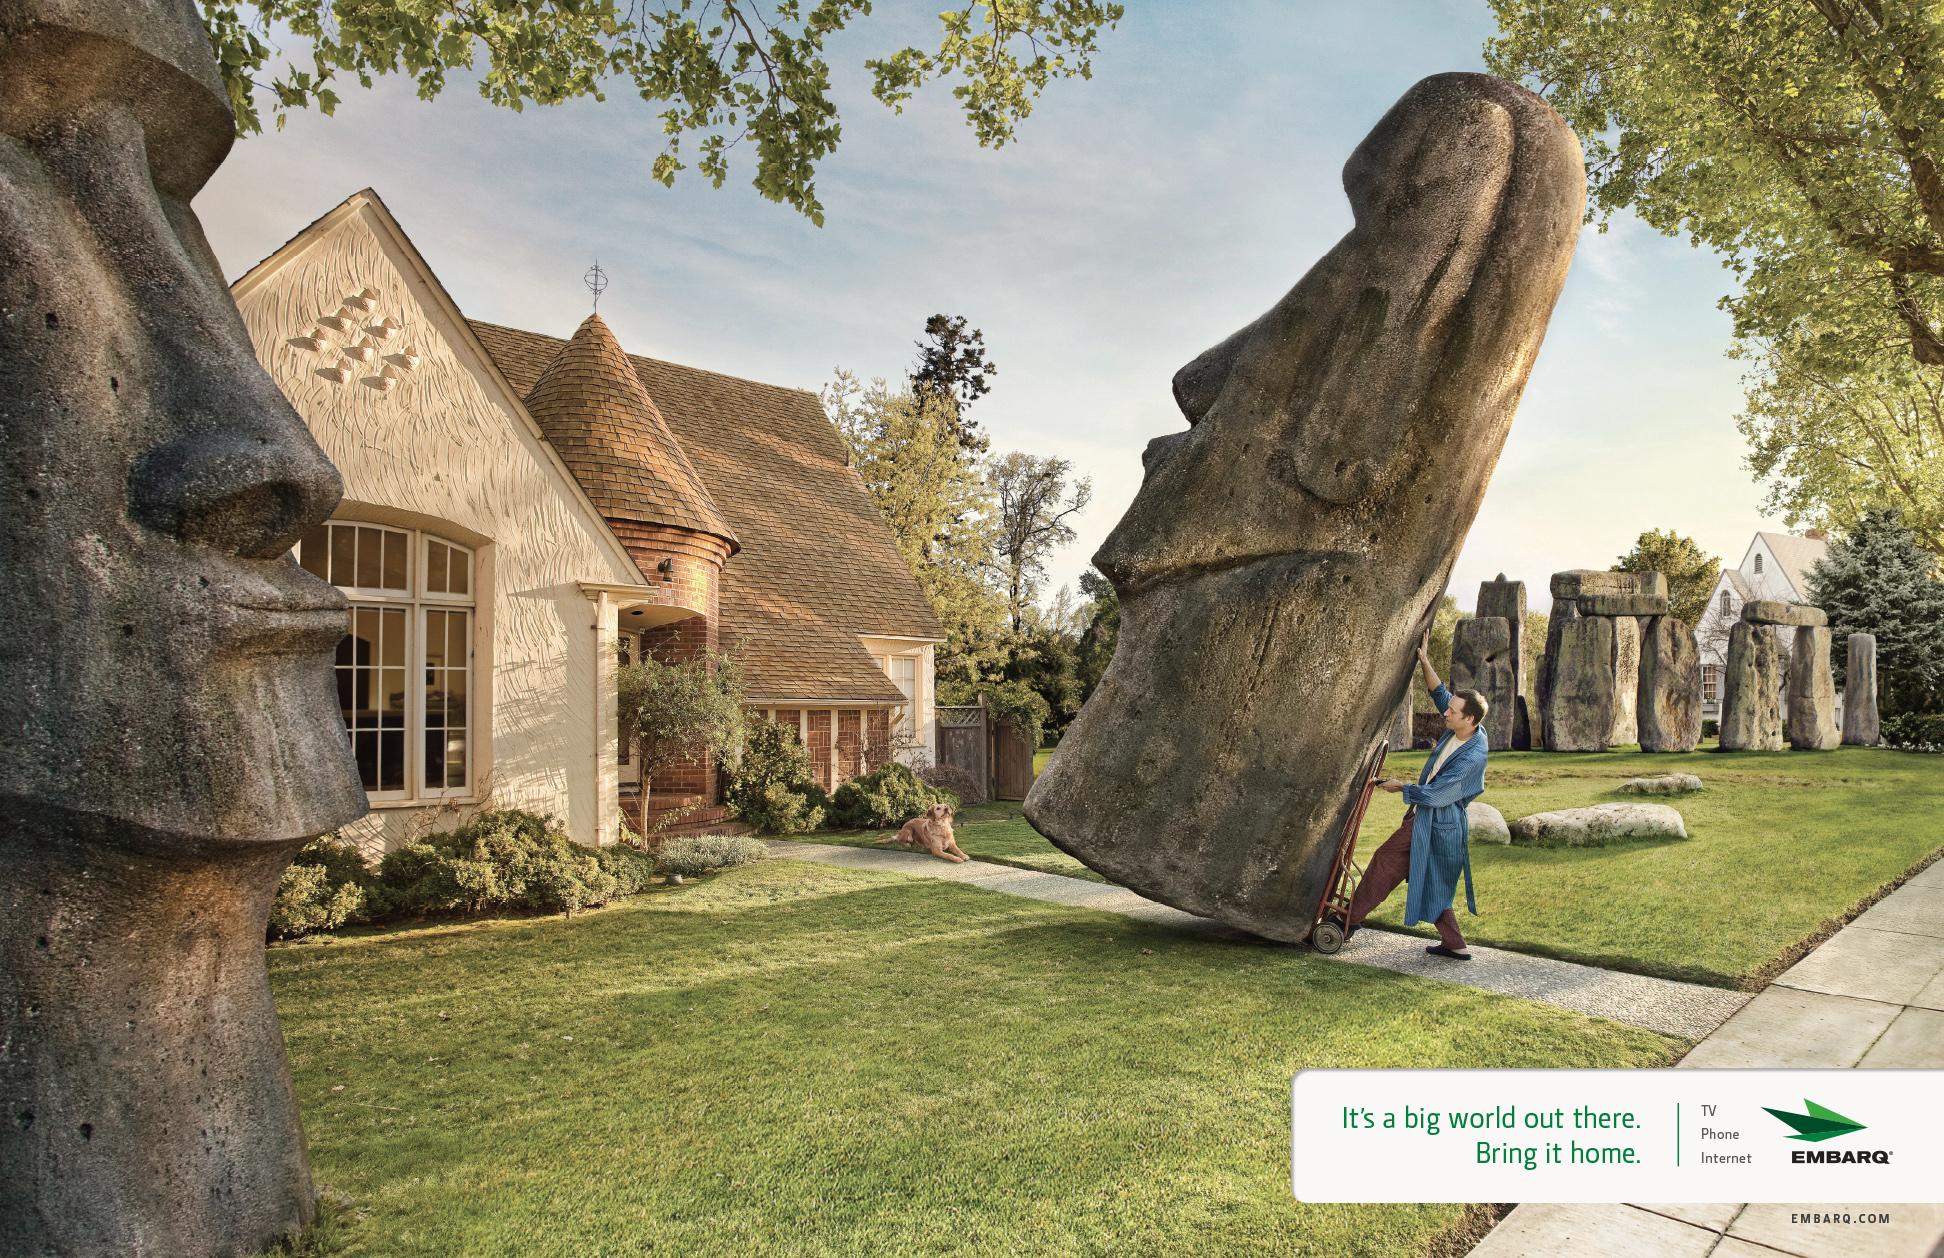 Easter Island Yard Gnomes